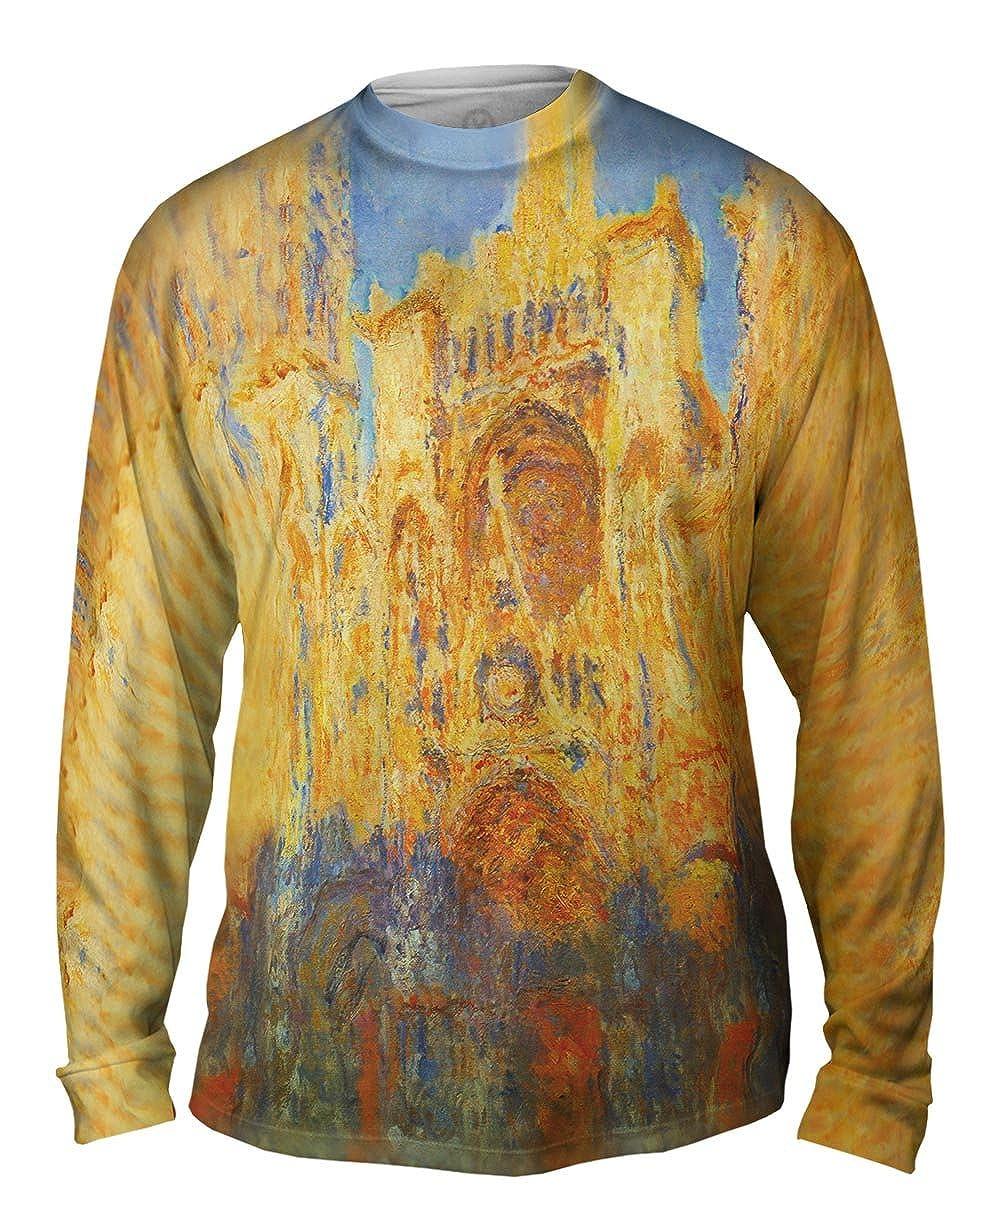 Yizzam Mens Long Sleeve 1893 Rouen Cathedral Sunset -TShirt Monet